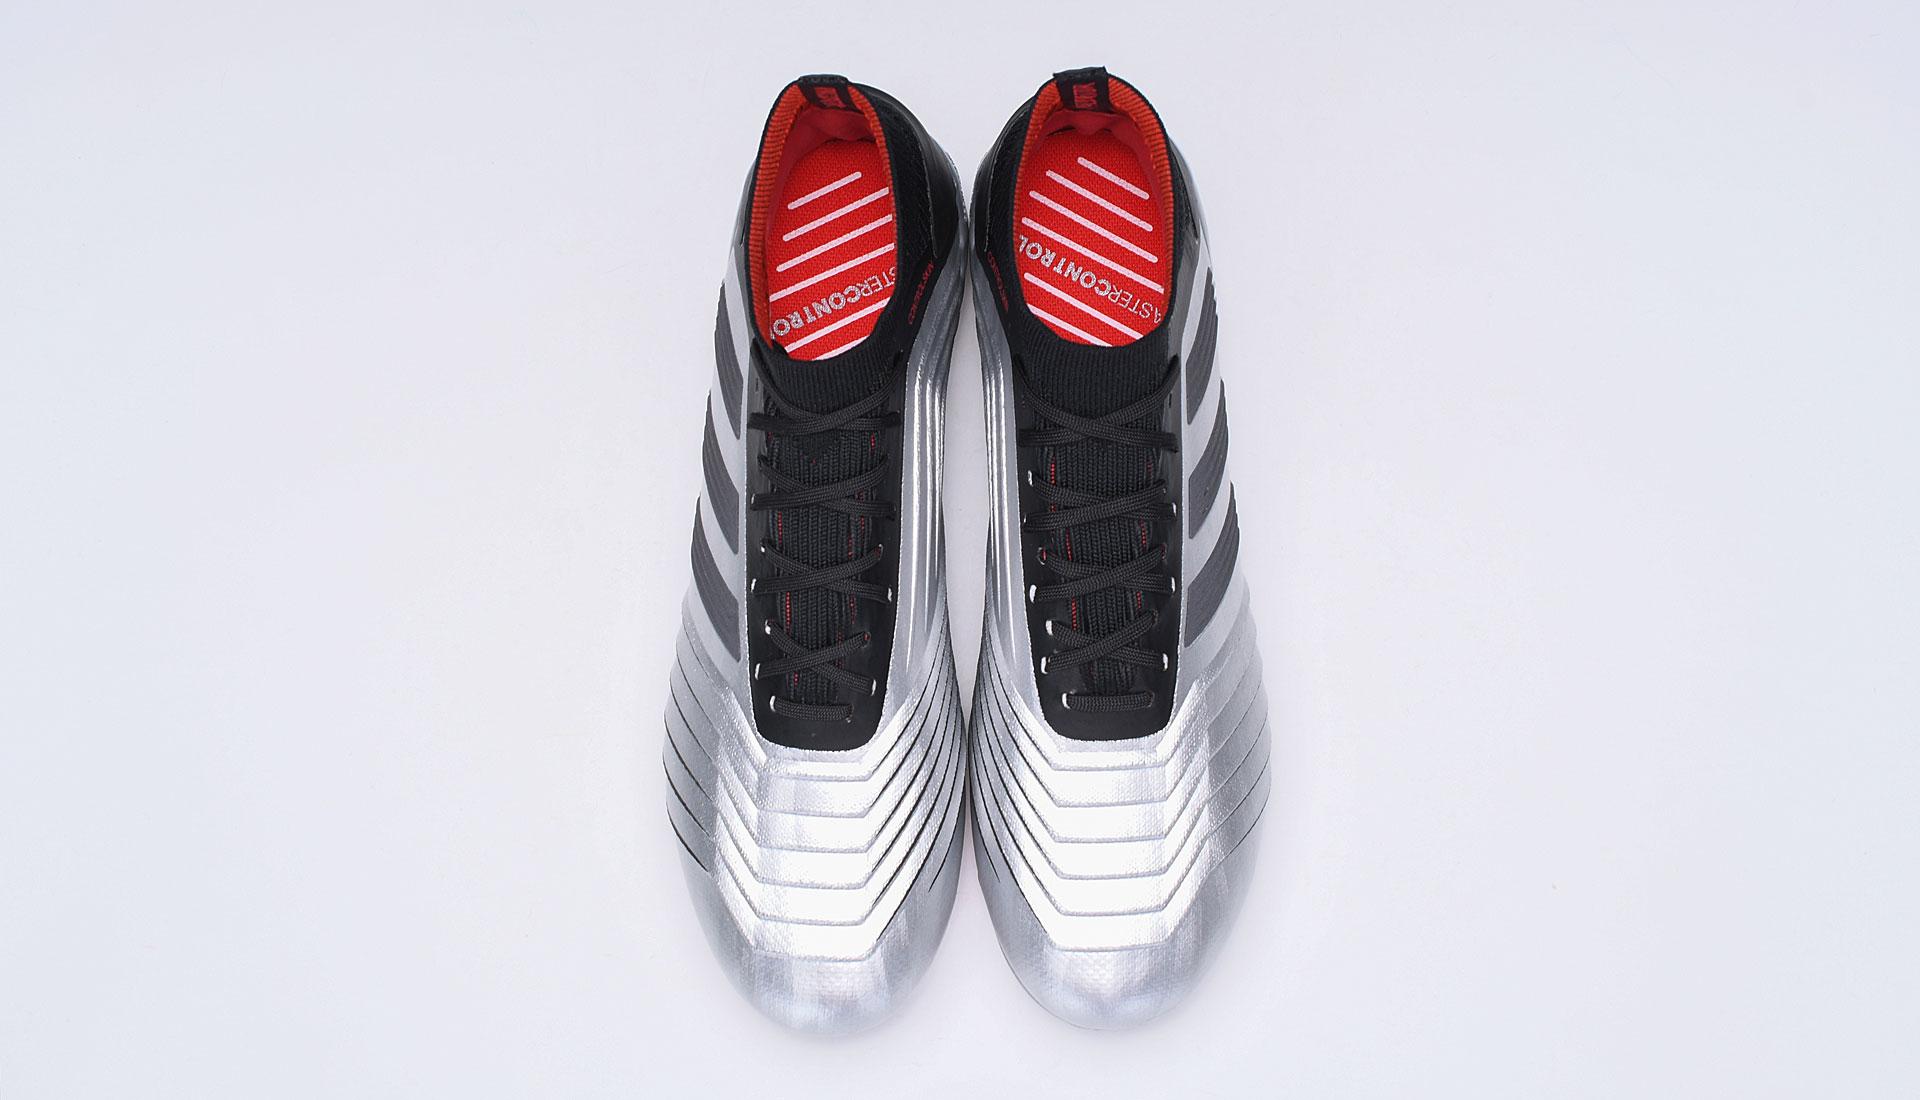 adidas Predator 19.1 AG Silver Red Football Boots